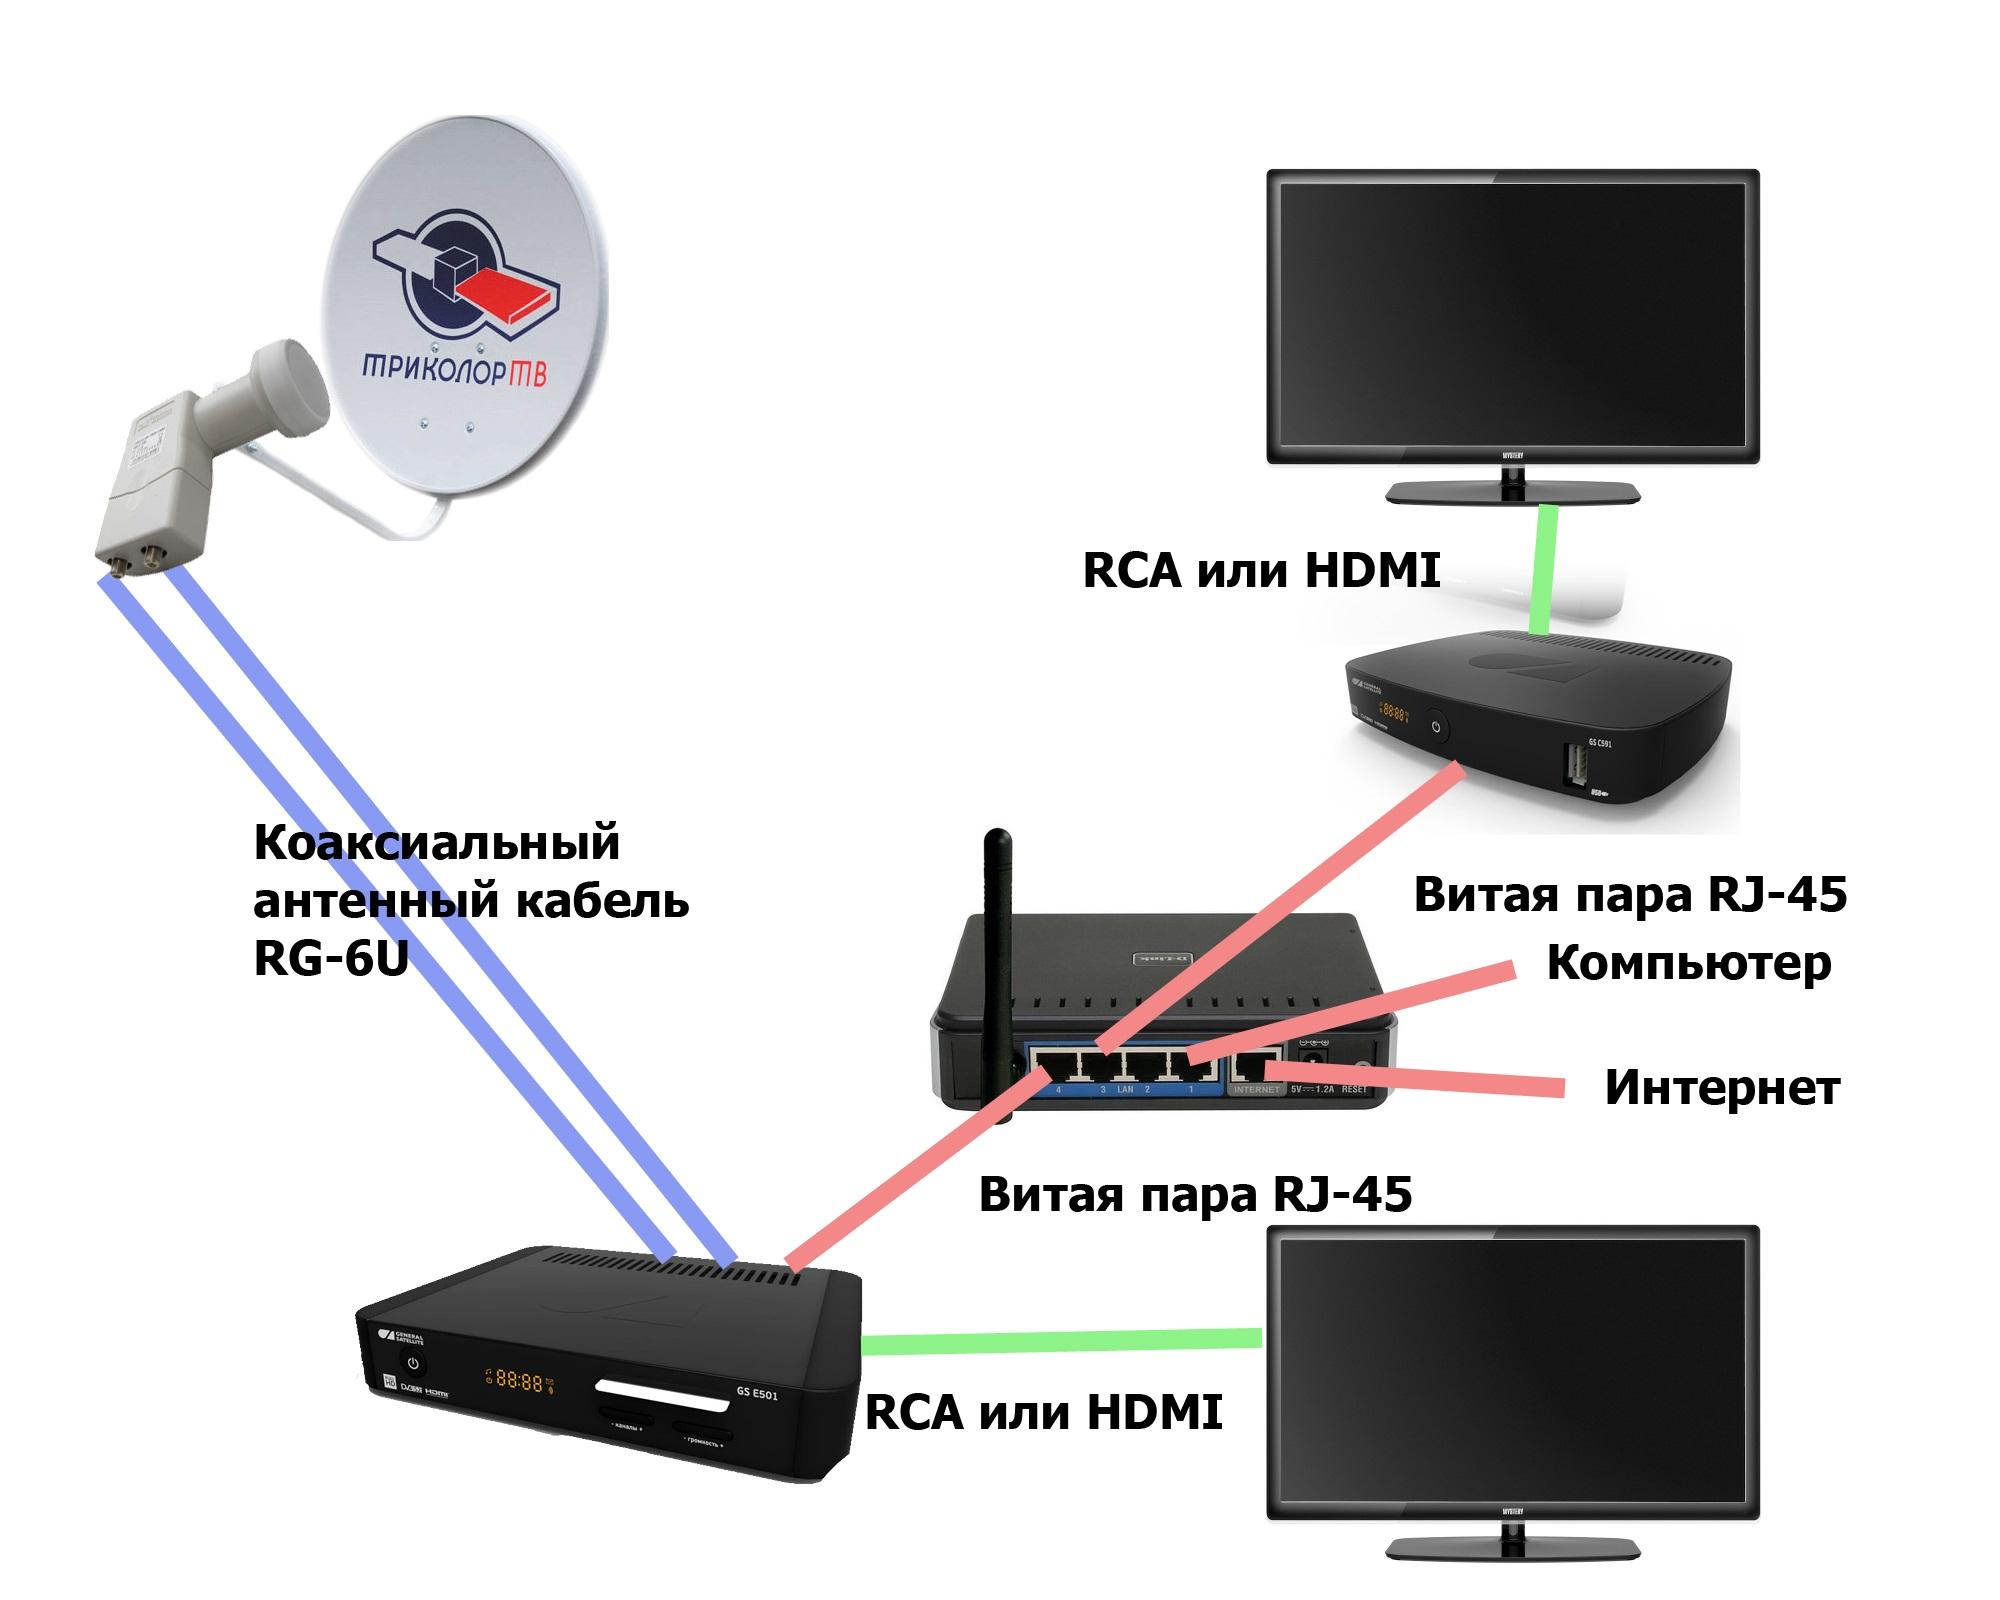 Схема установки антенны триколор на два телевизора